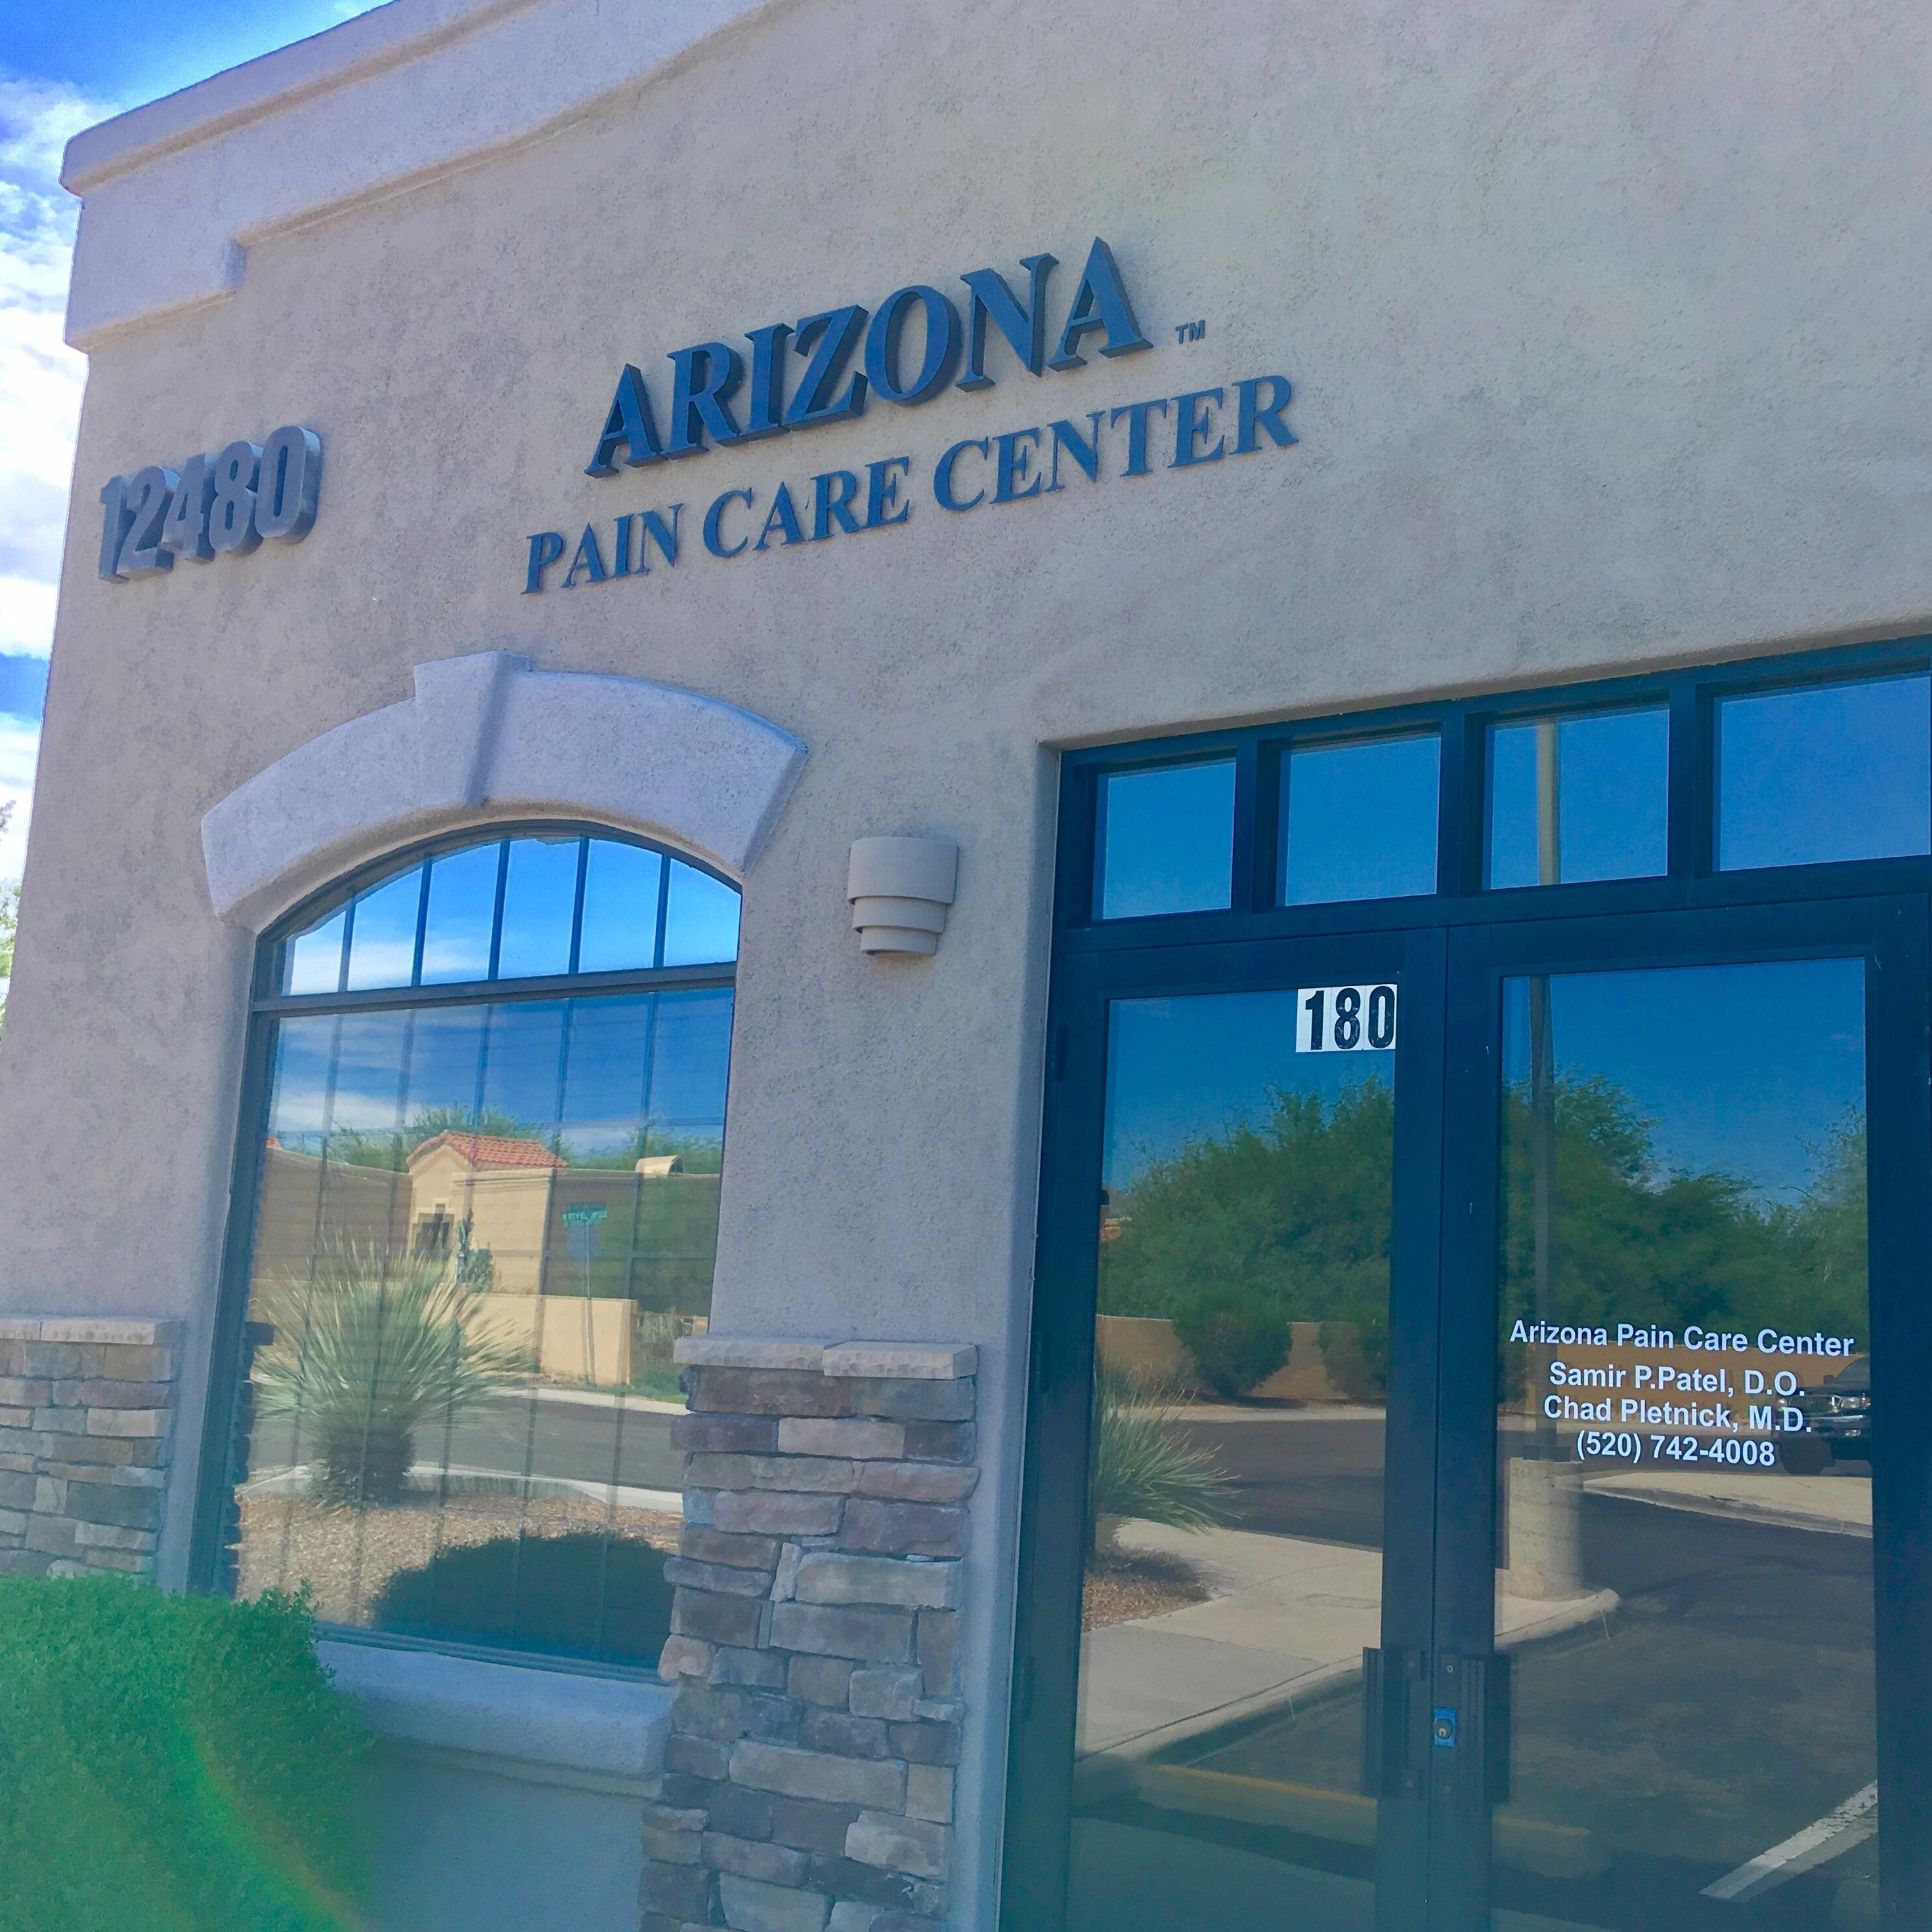 Arizona Pain Care Center image 0